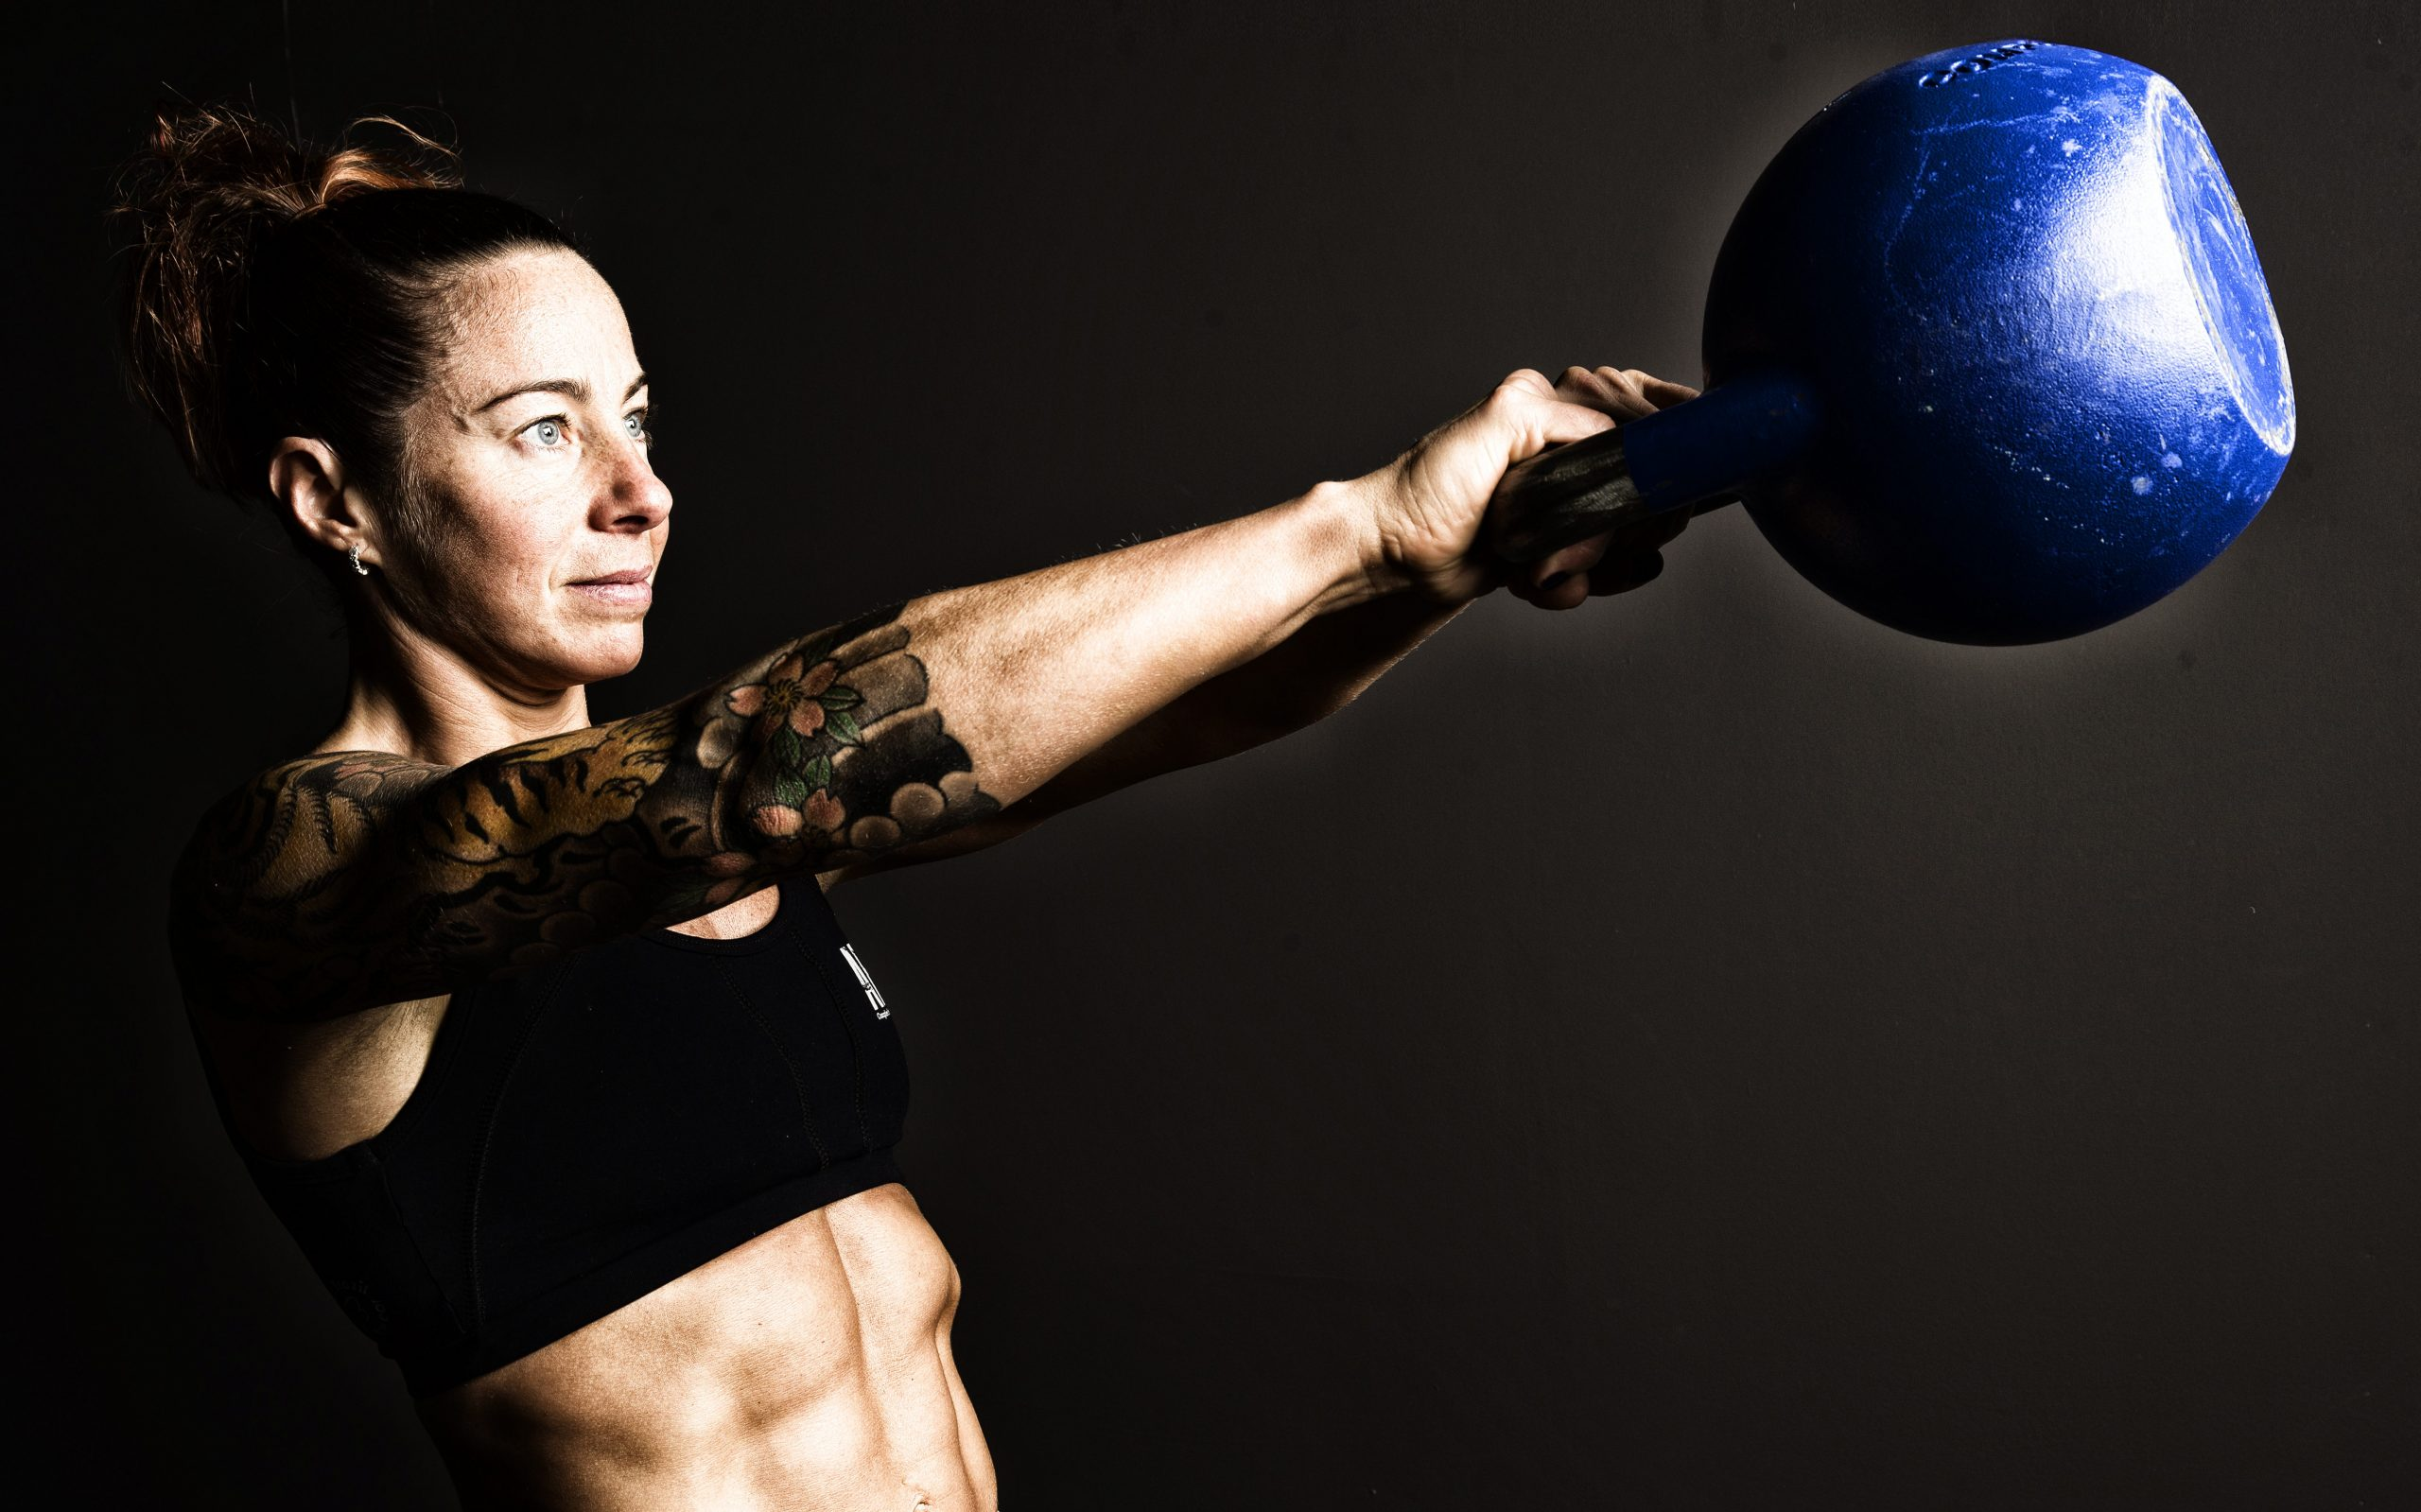 mujer entrenando con Kettlebells allfreeweight